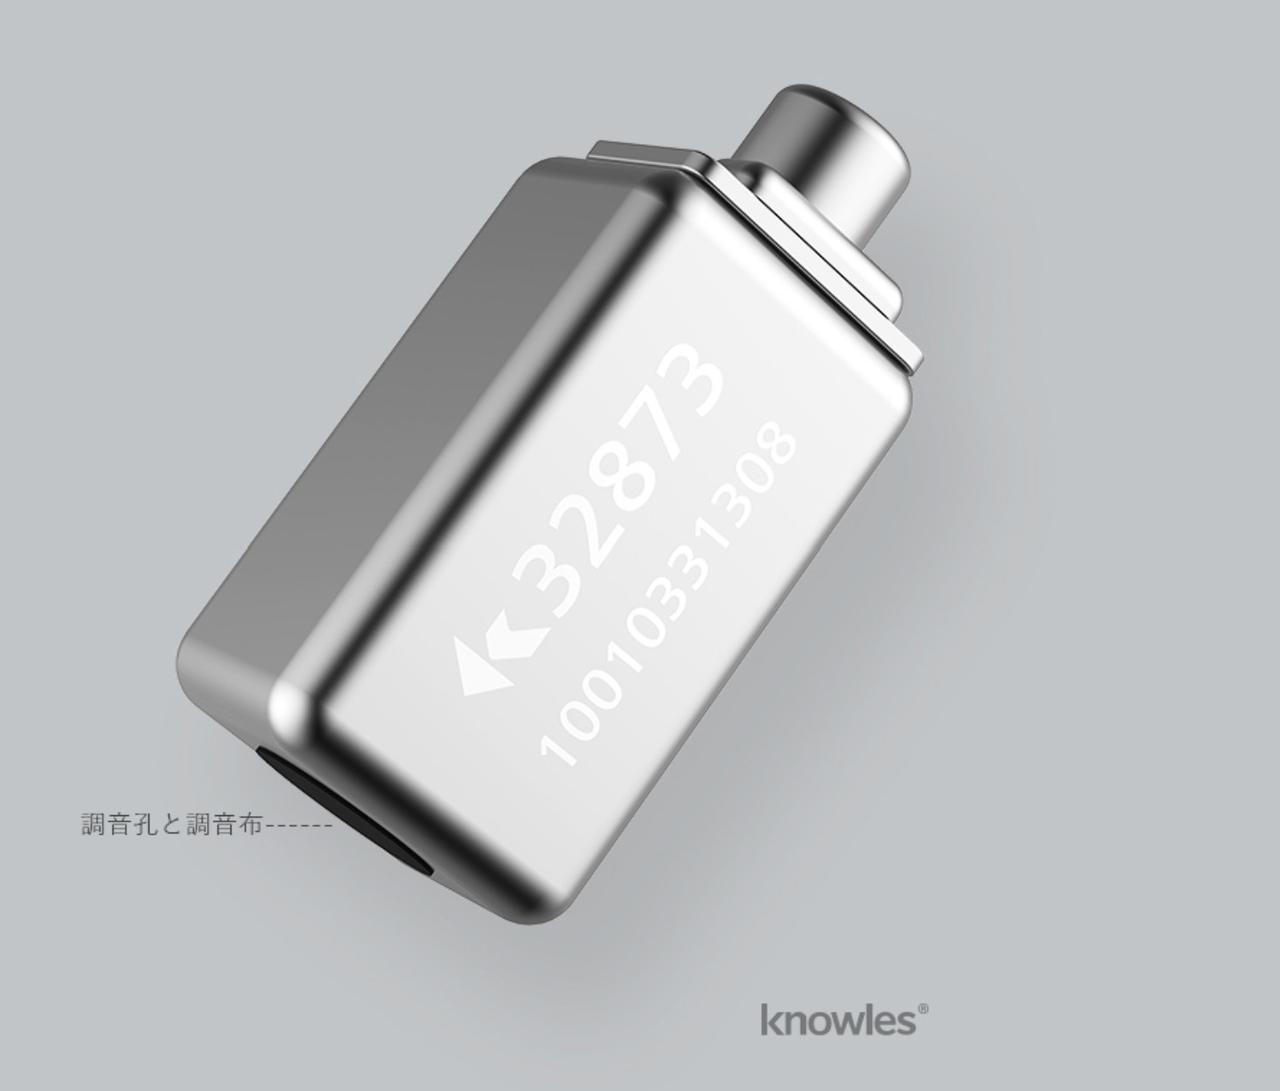 SIMGOT EM2はデュアルドライバで臨場感・迫力たっぷり、ハイレゾ音源にも対応